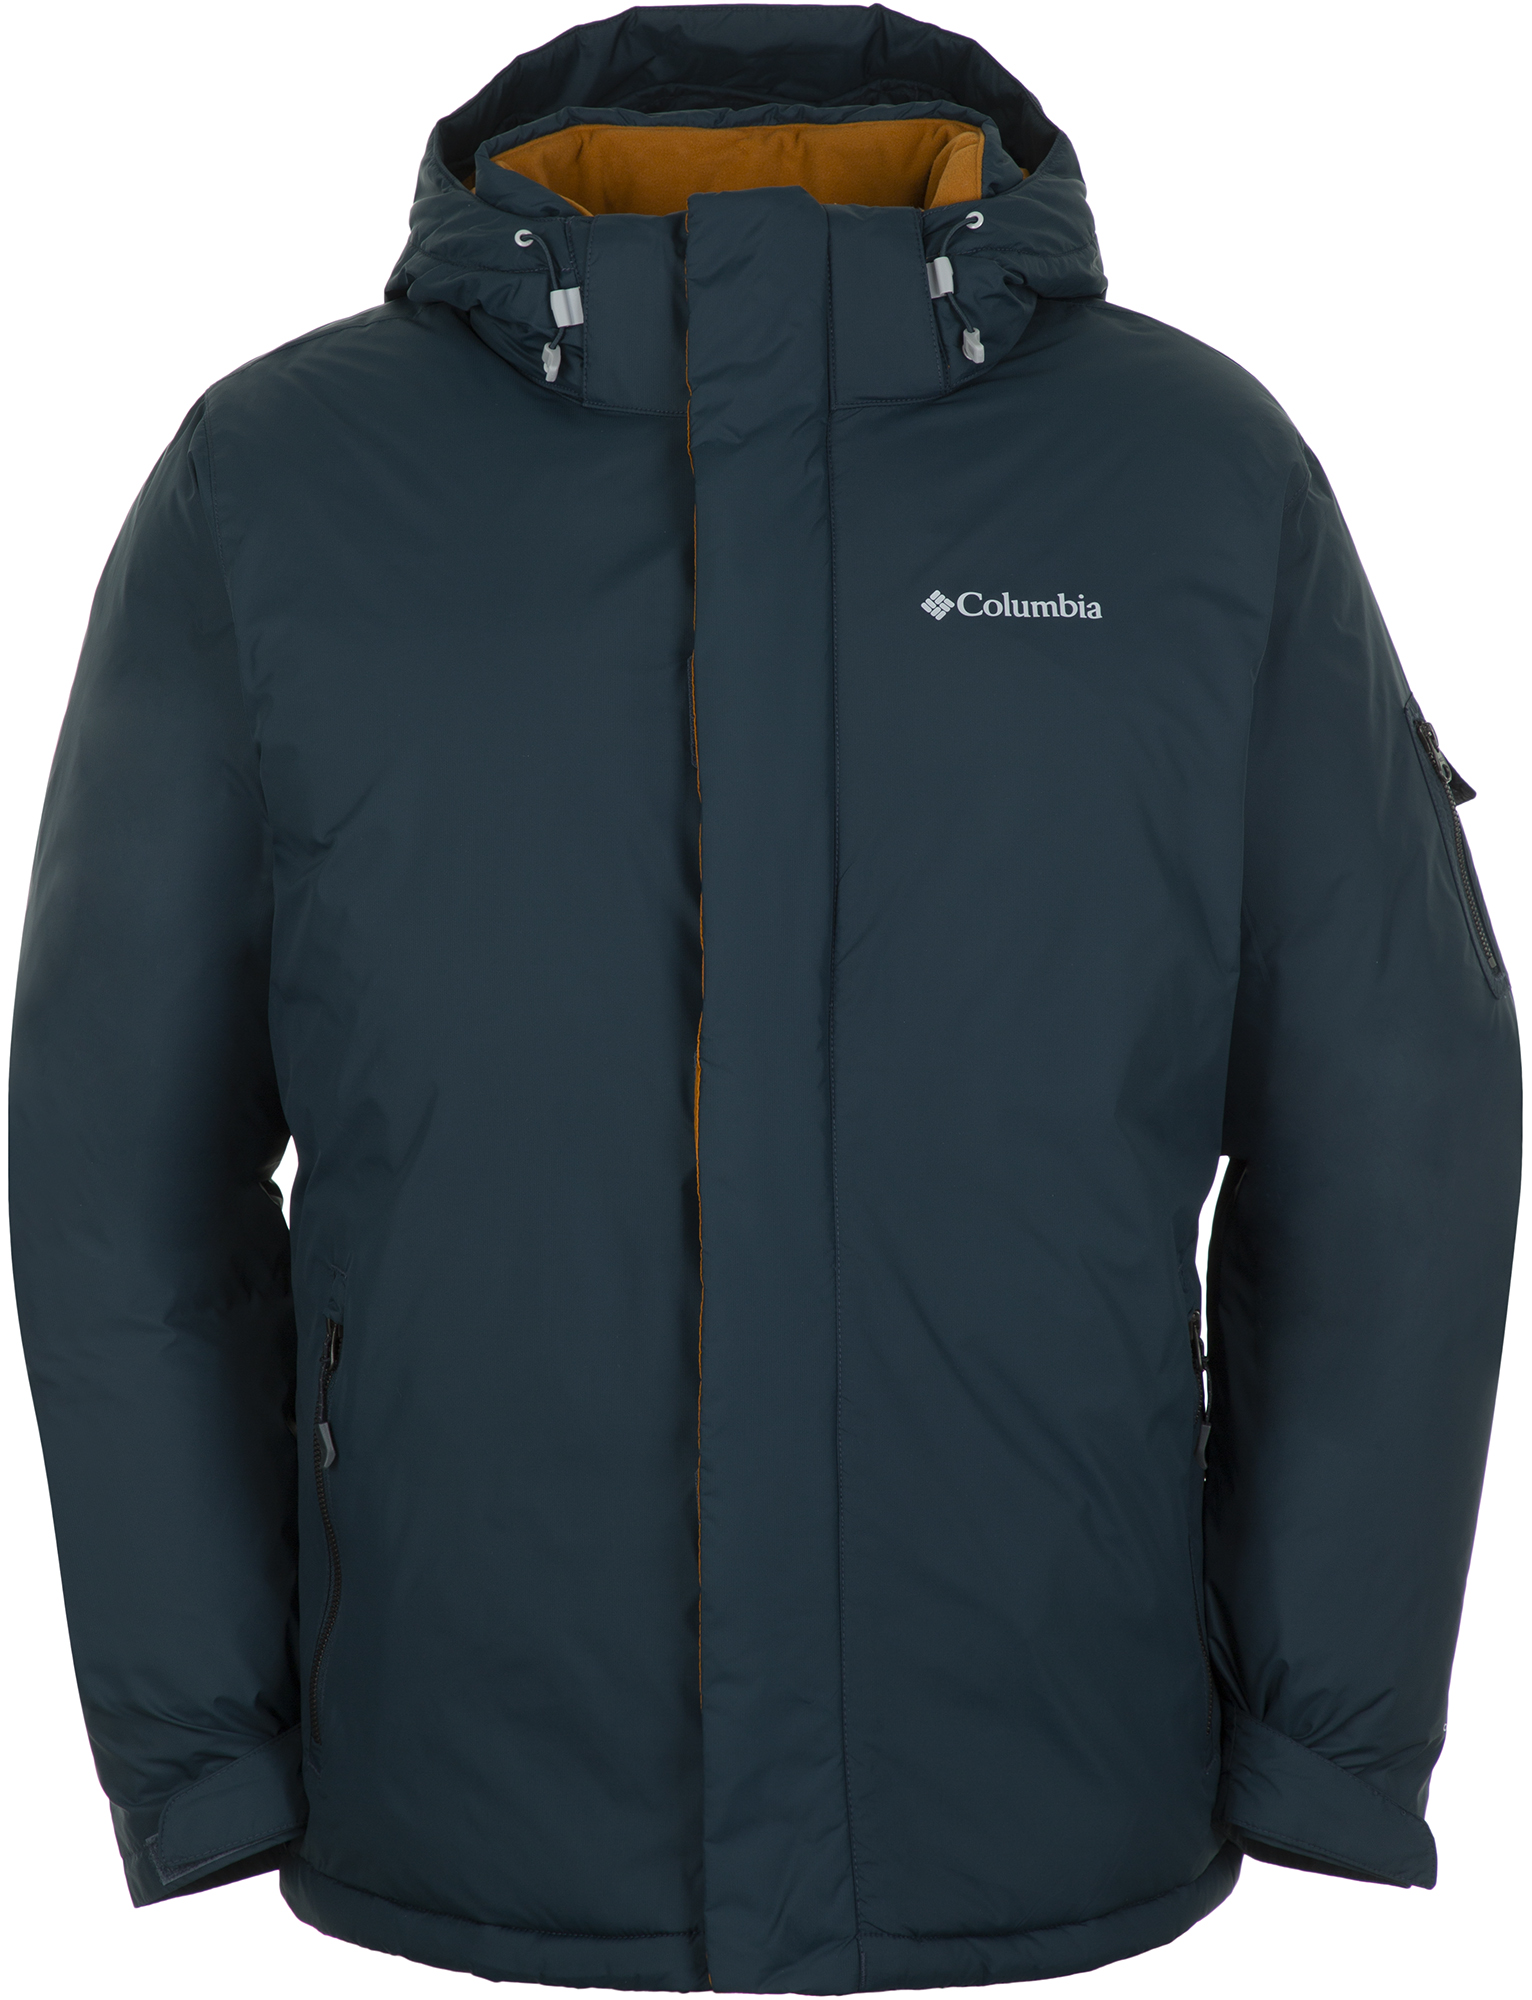 Columbia Куртка пуховая мужская Wildhorse Crest II, размер 46